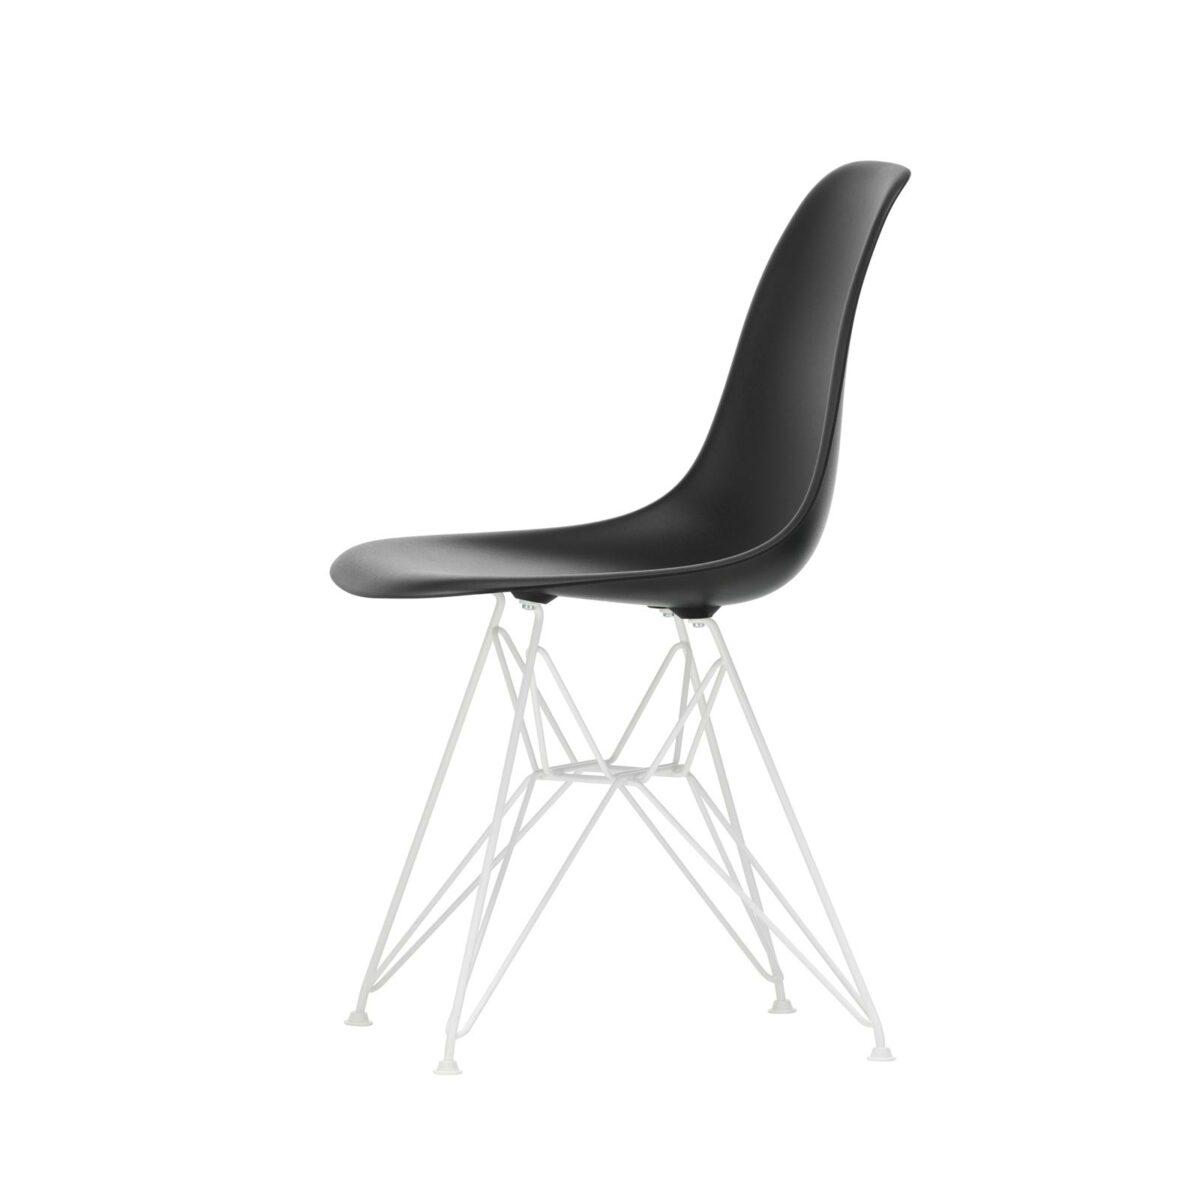 3034944 Eames Plastic Side Chair DSR 12 deep black 04 white powder coated left master